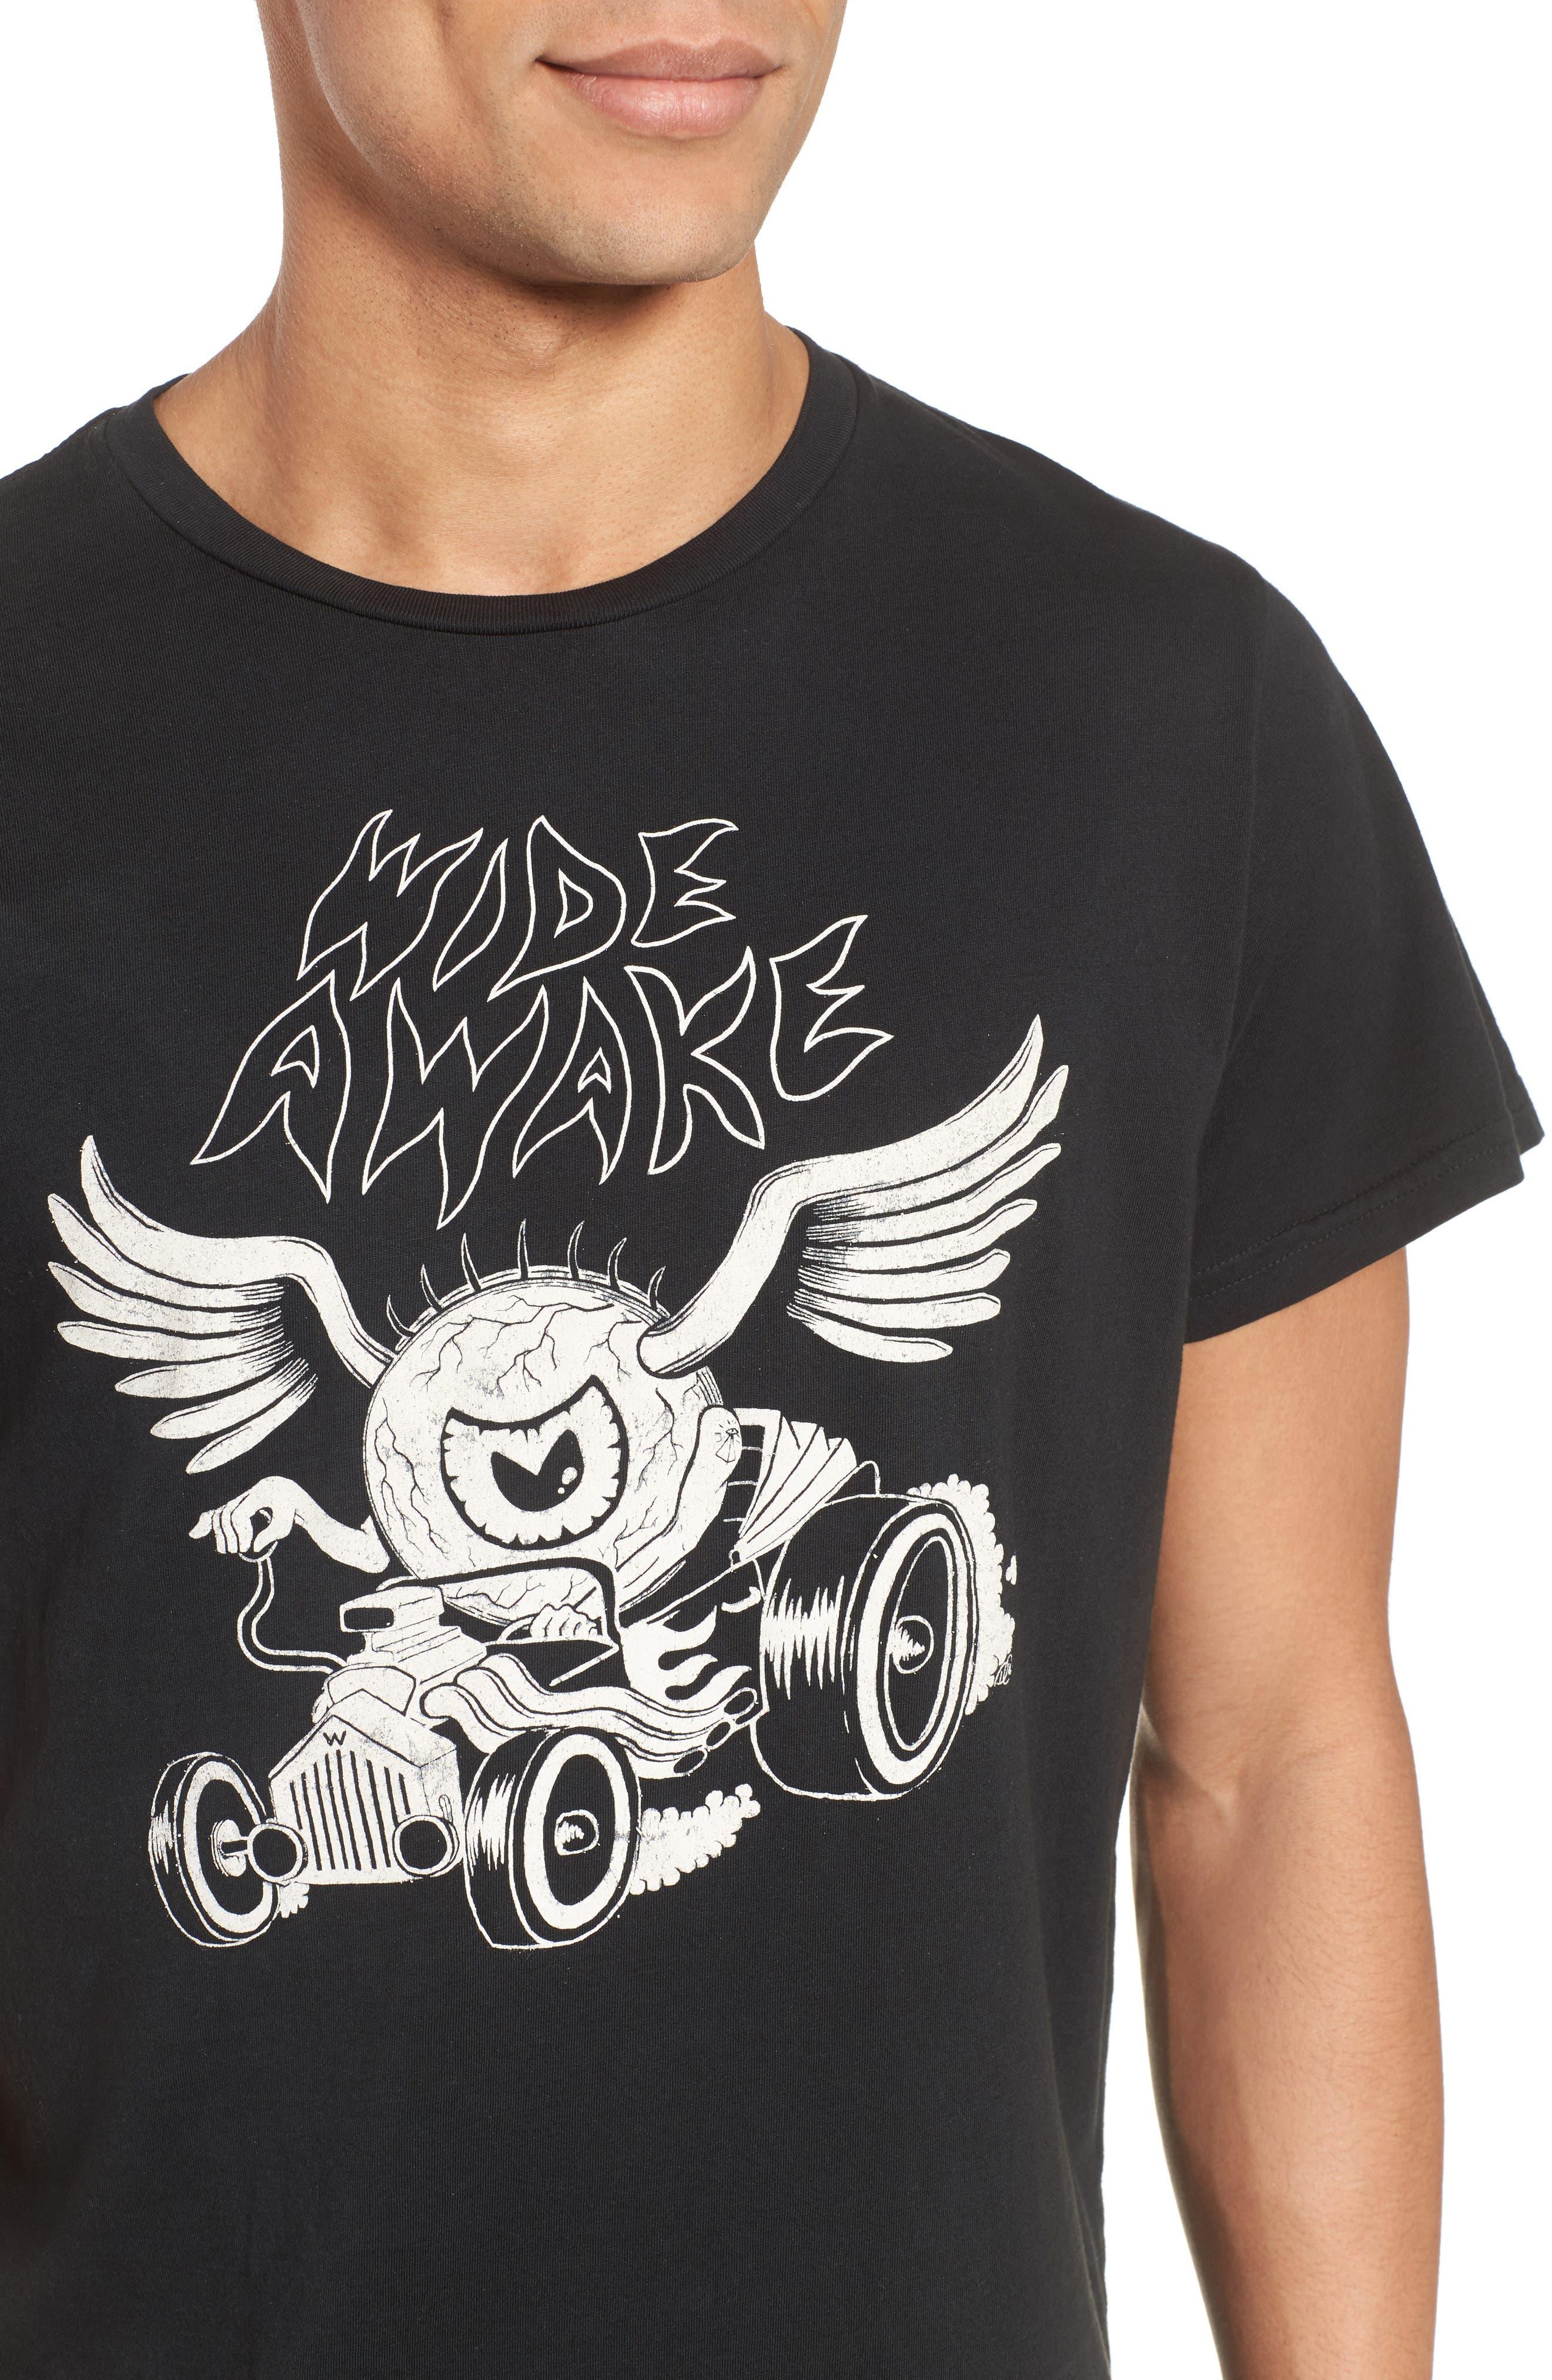 Wide Awake Graphic T-Shirt,                             Alternate thumbnail 4, color,                             Dusty Black